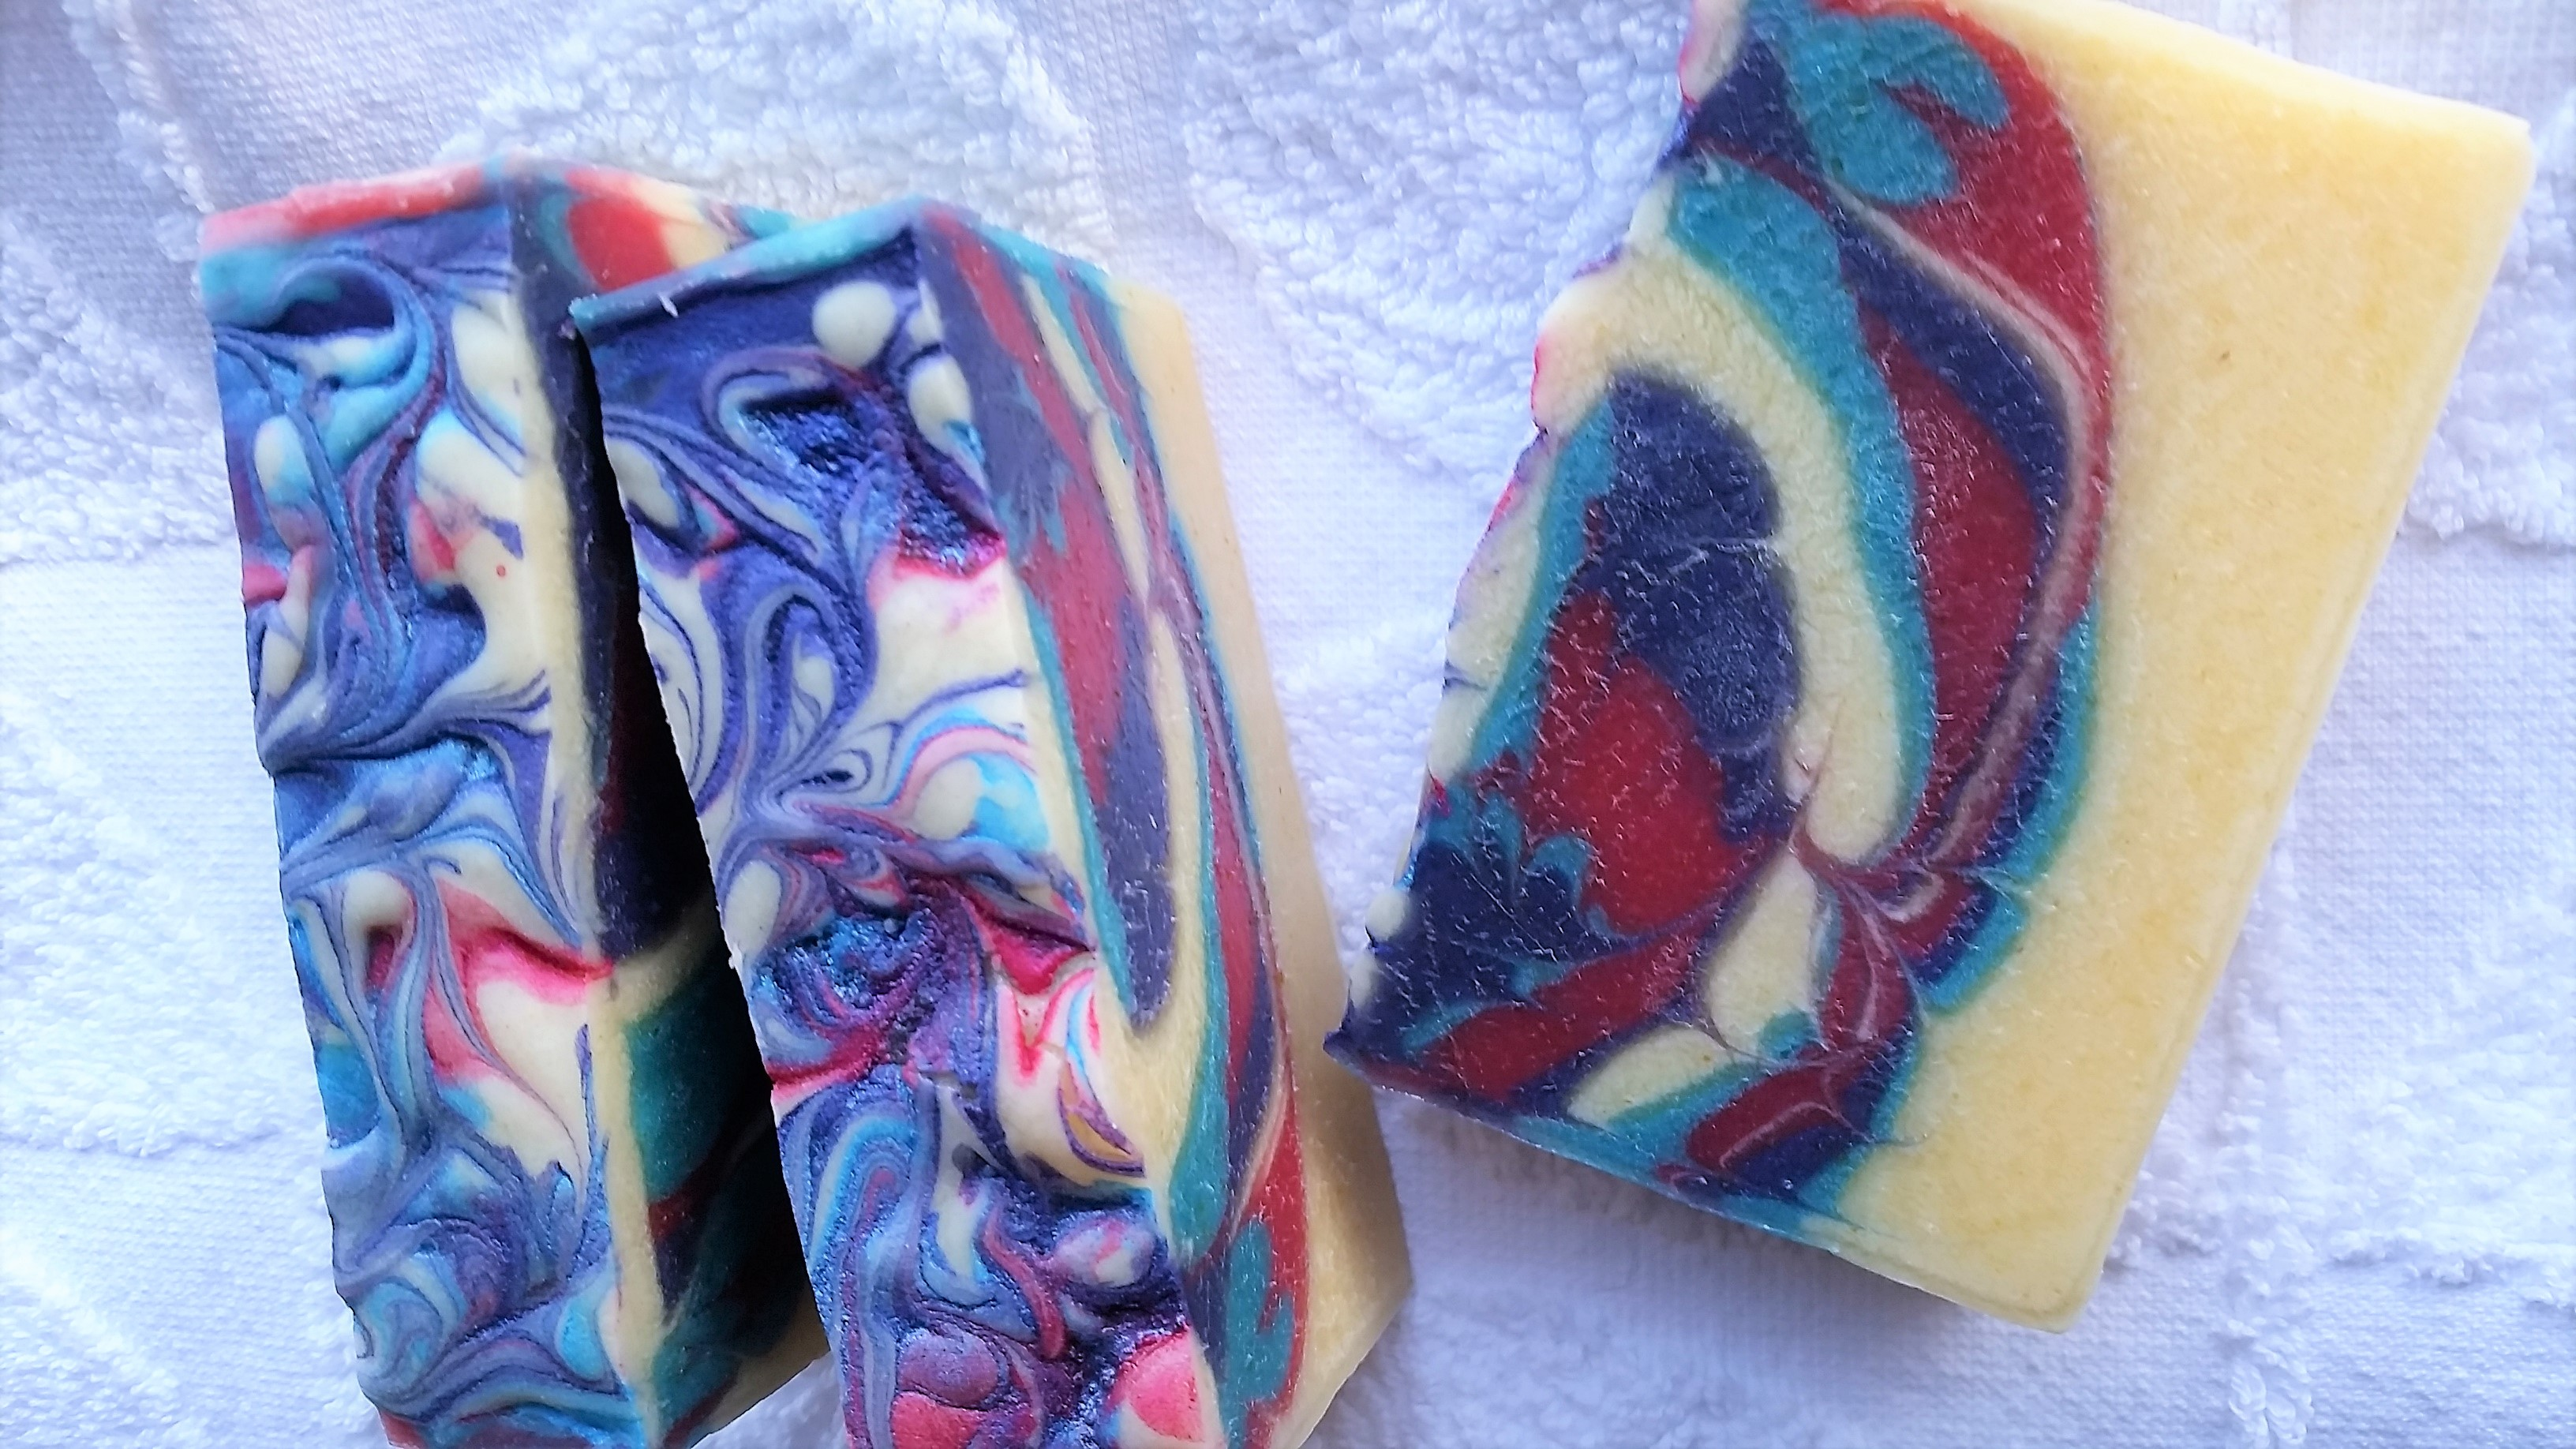 amanda s first soap